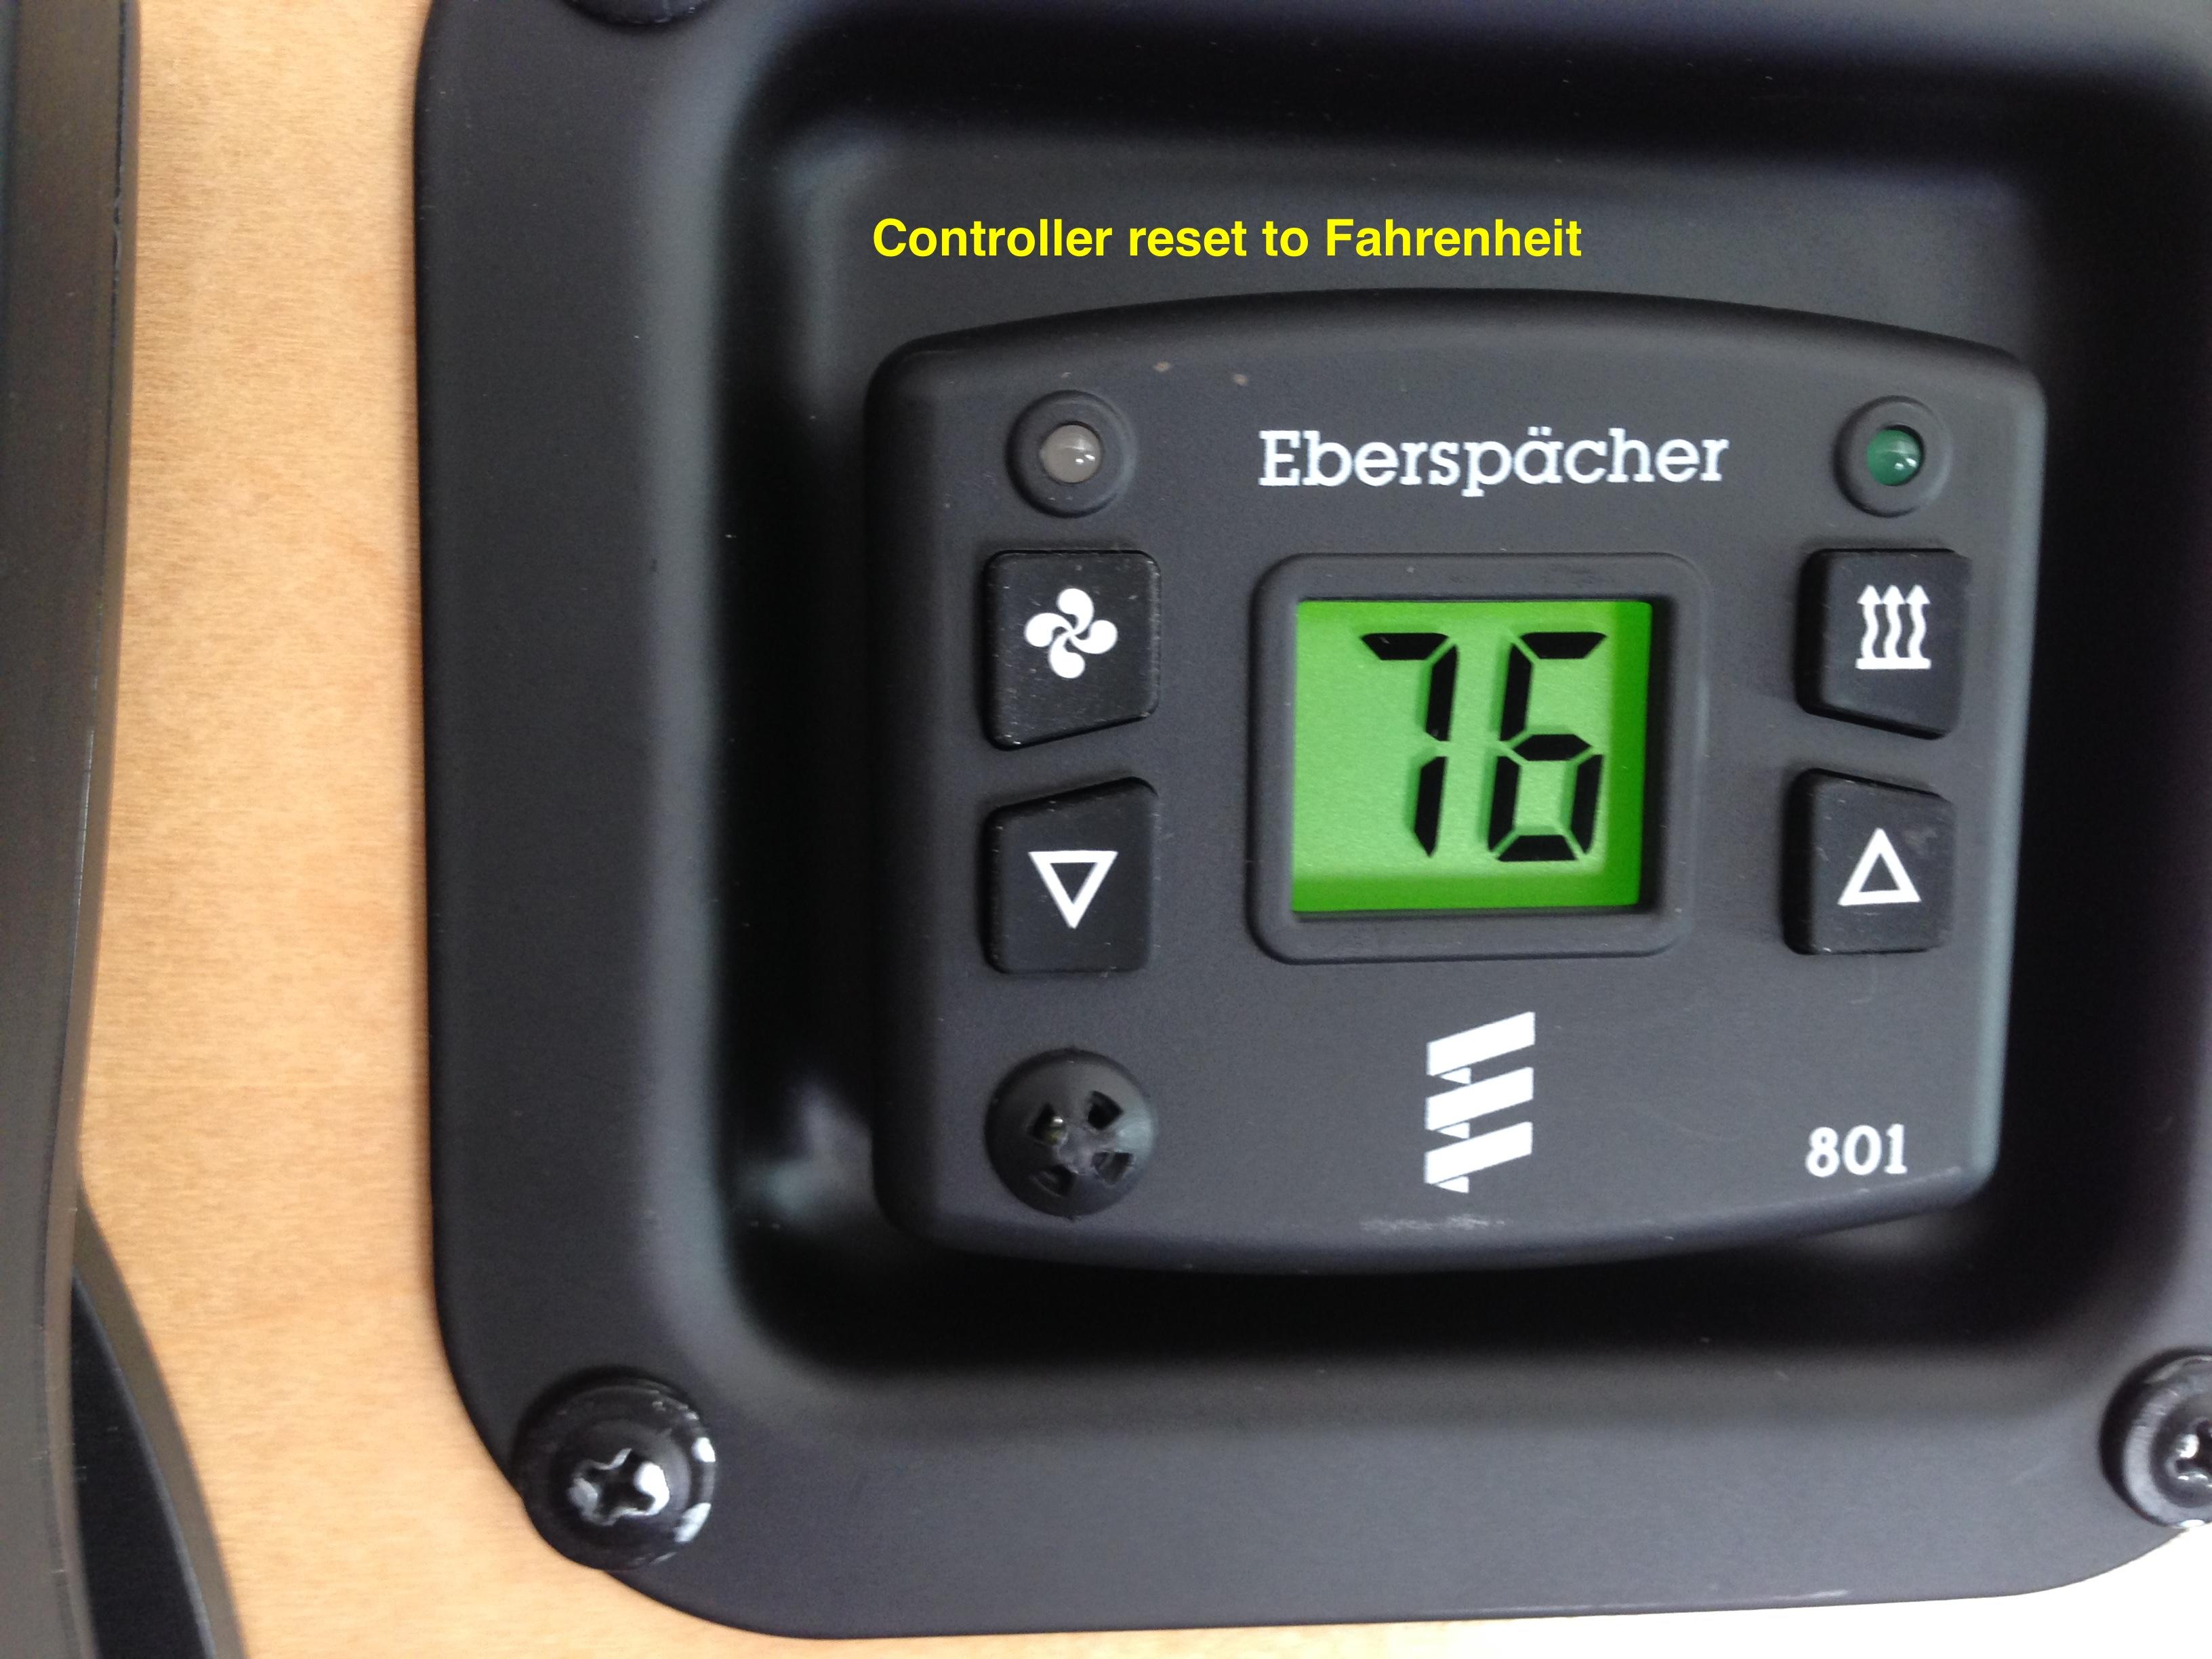 Eberspacher 801 Control Wiring Diagram Diagrams Data Base Gm Cruise Espar Heater Installation Diy Guide Radvanadventures Com Rh On Vfd For